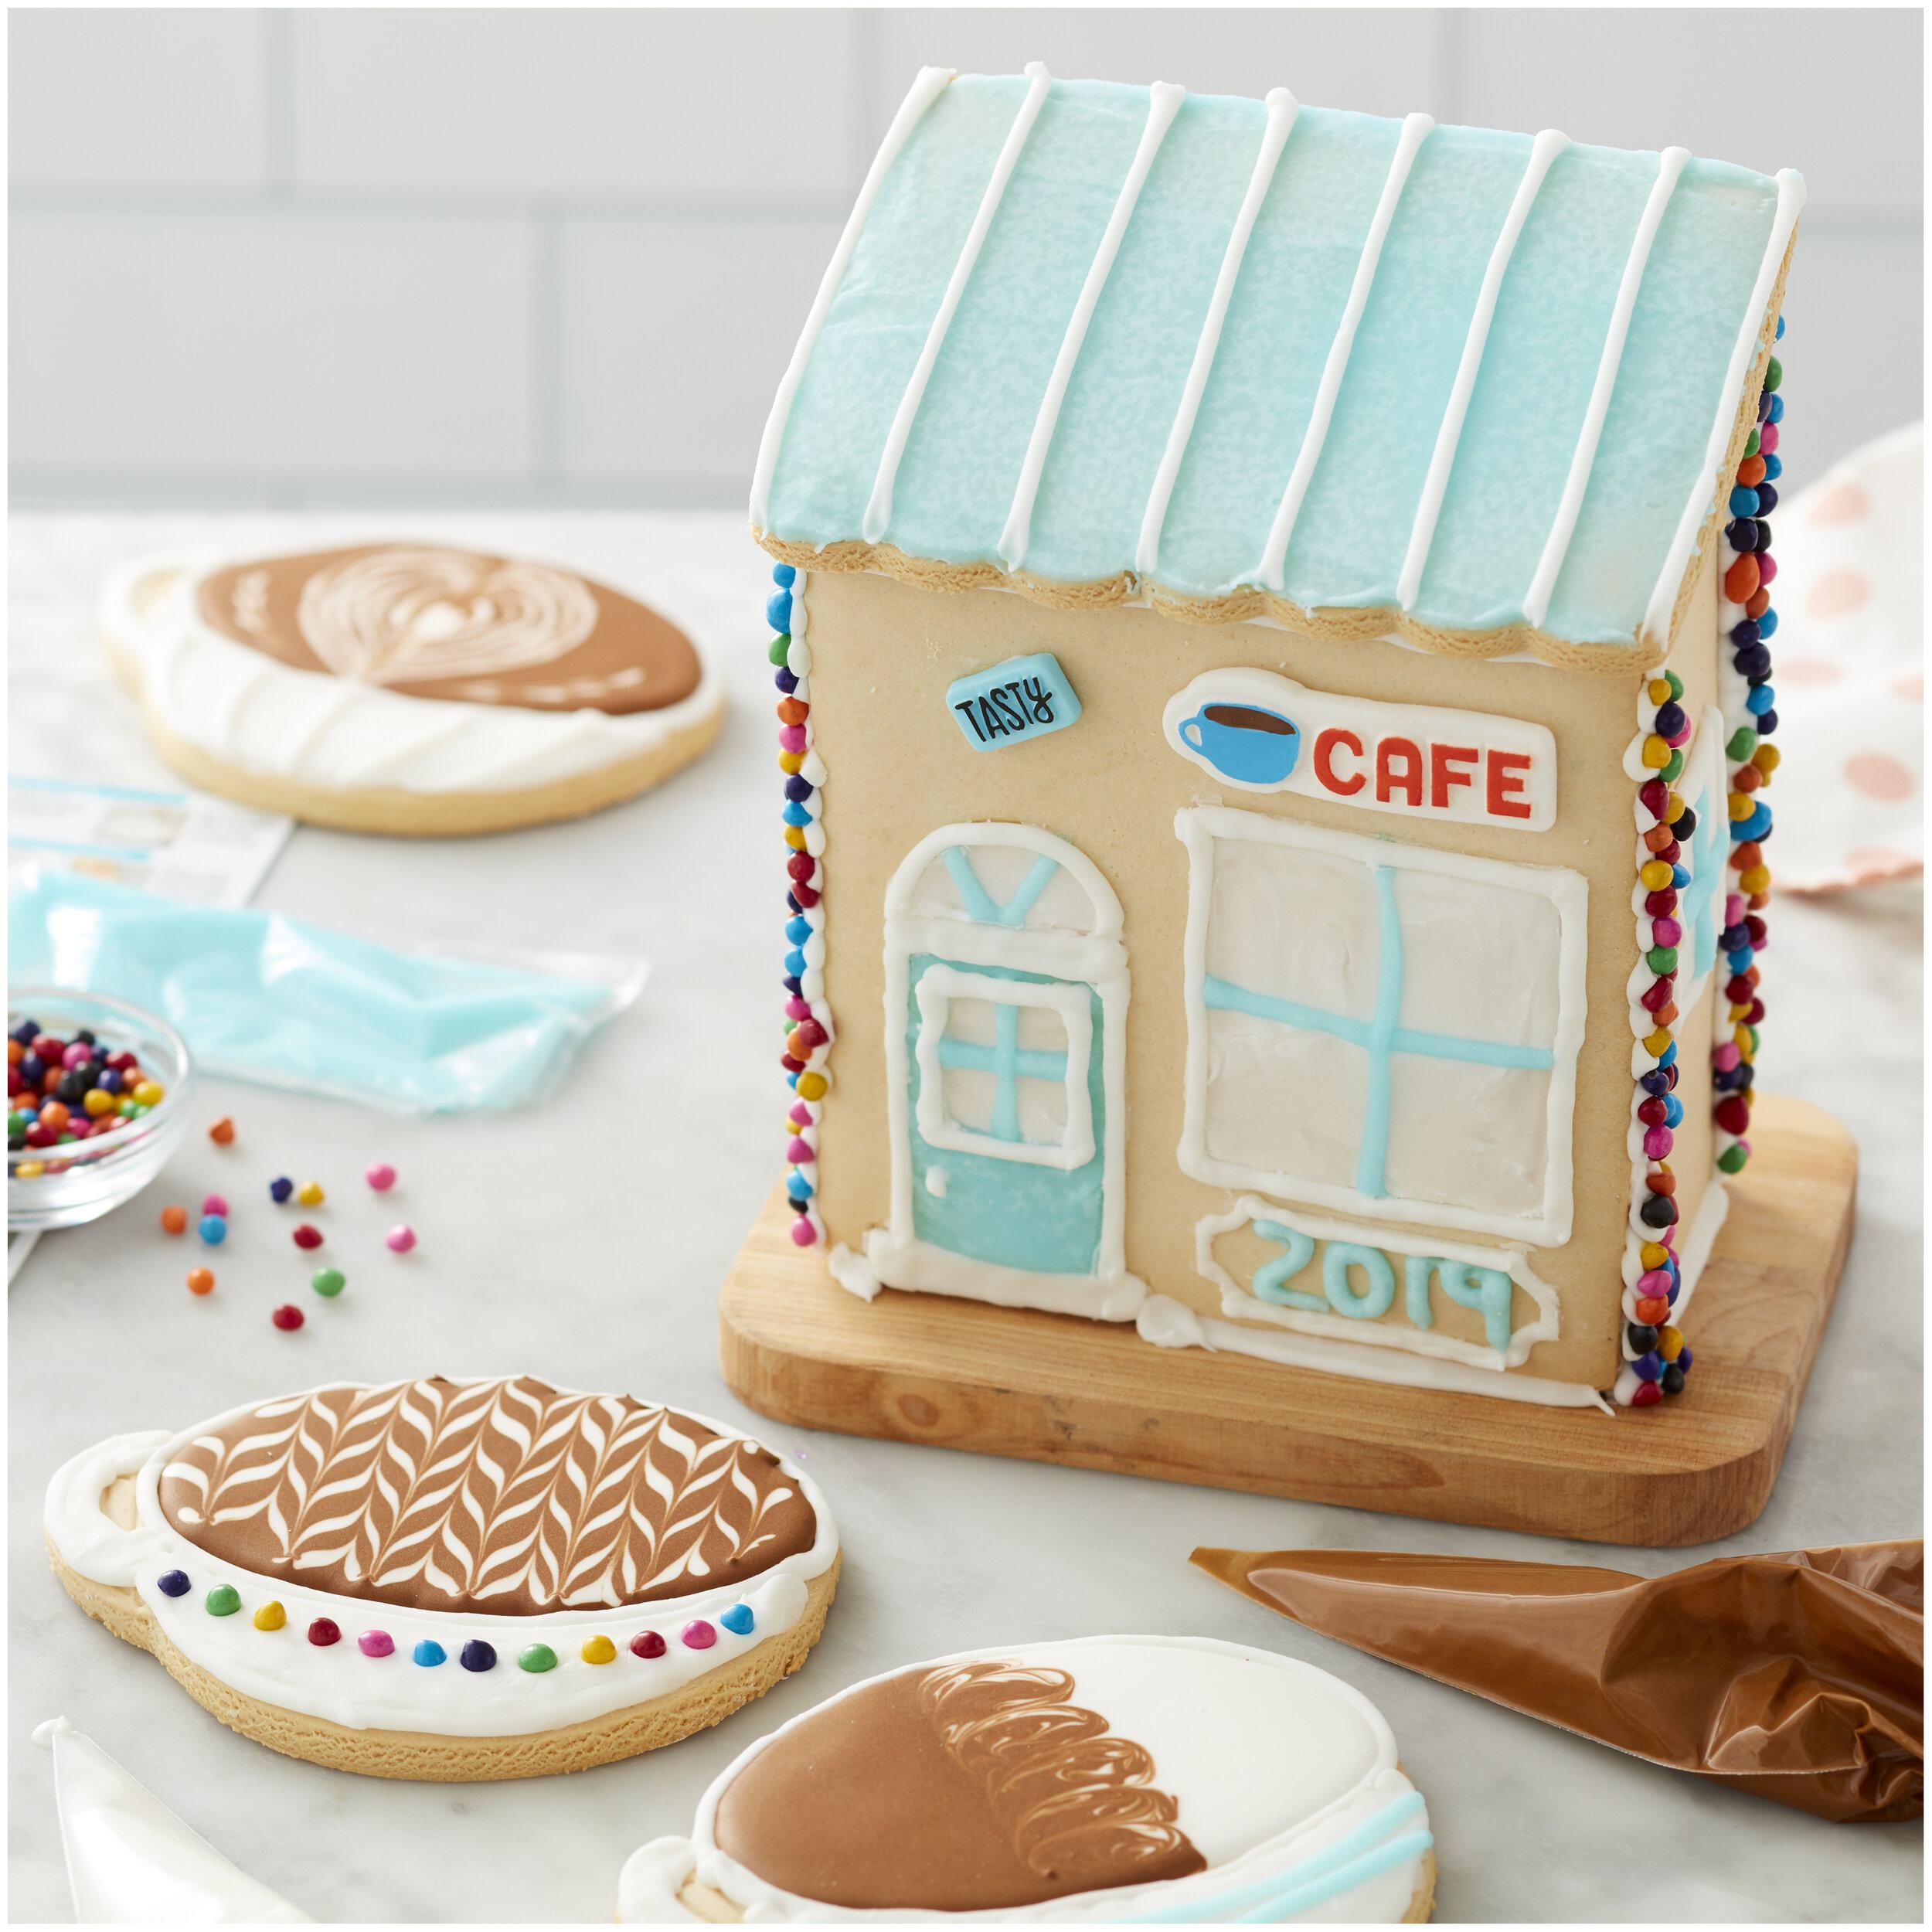 Coffee Shop Cookie Kit - $14.98